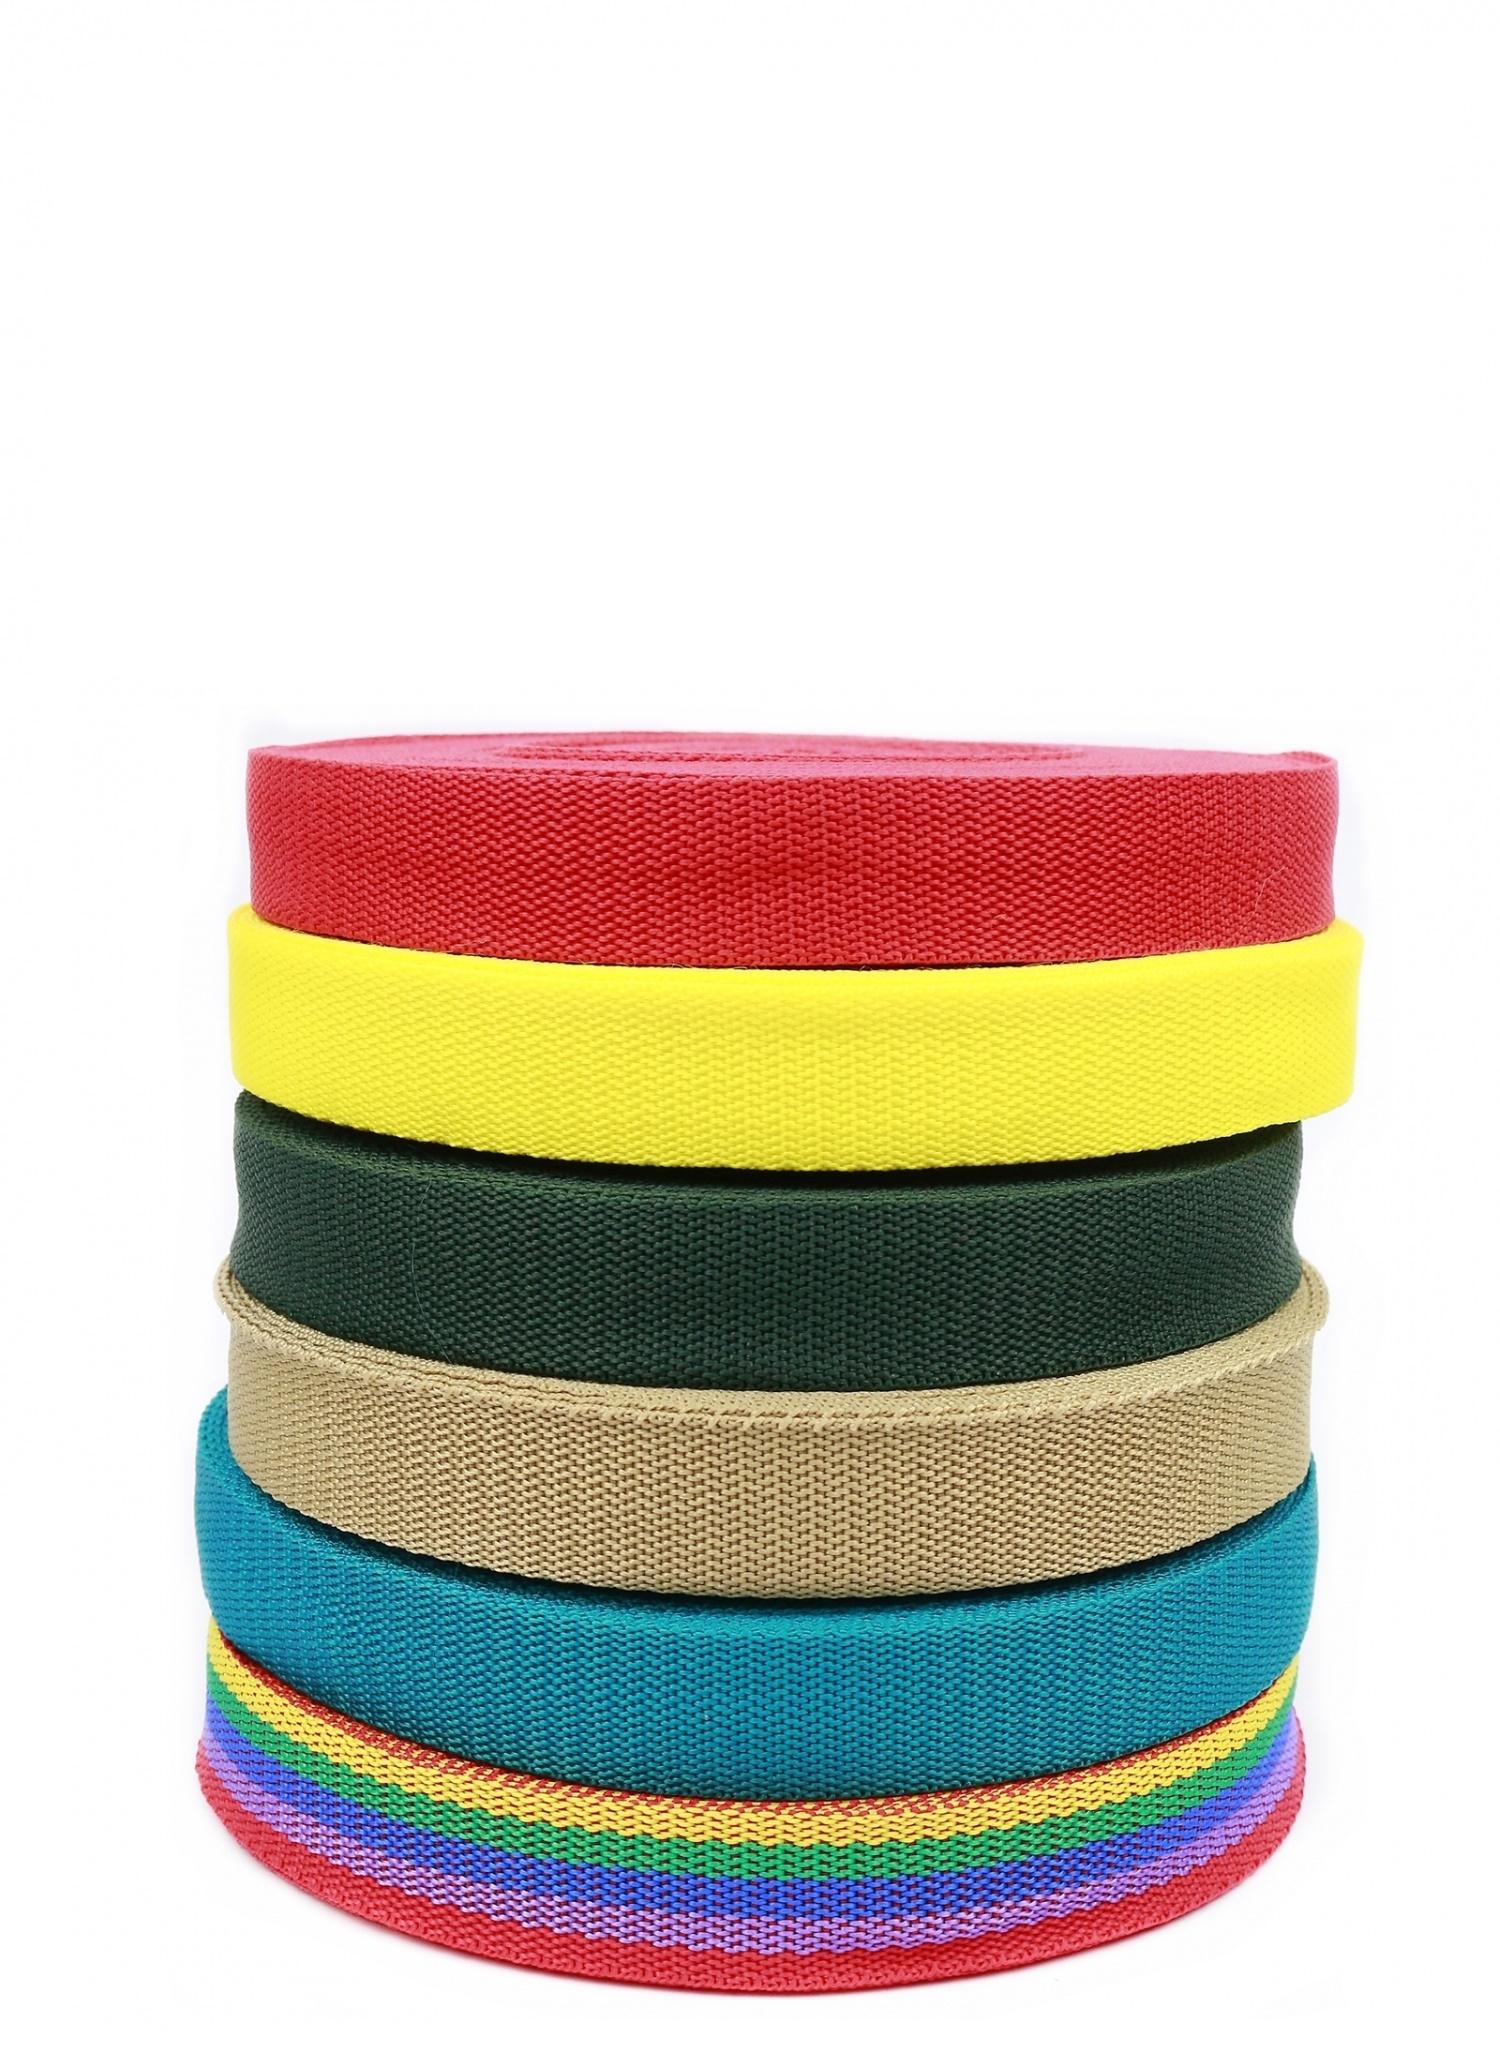 Chinga elastica, textila sau polipropilena  Chinga elastica, textila sau polipropilena